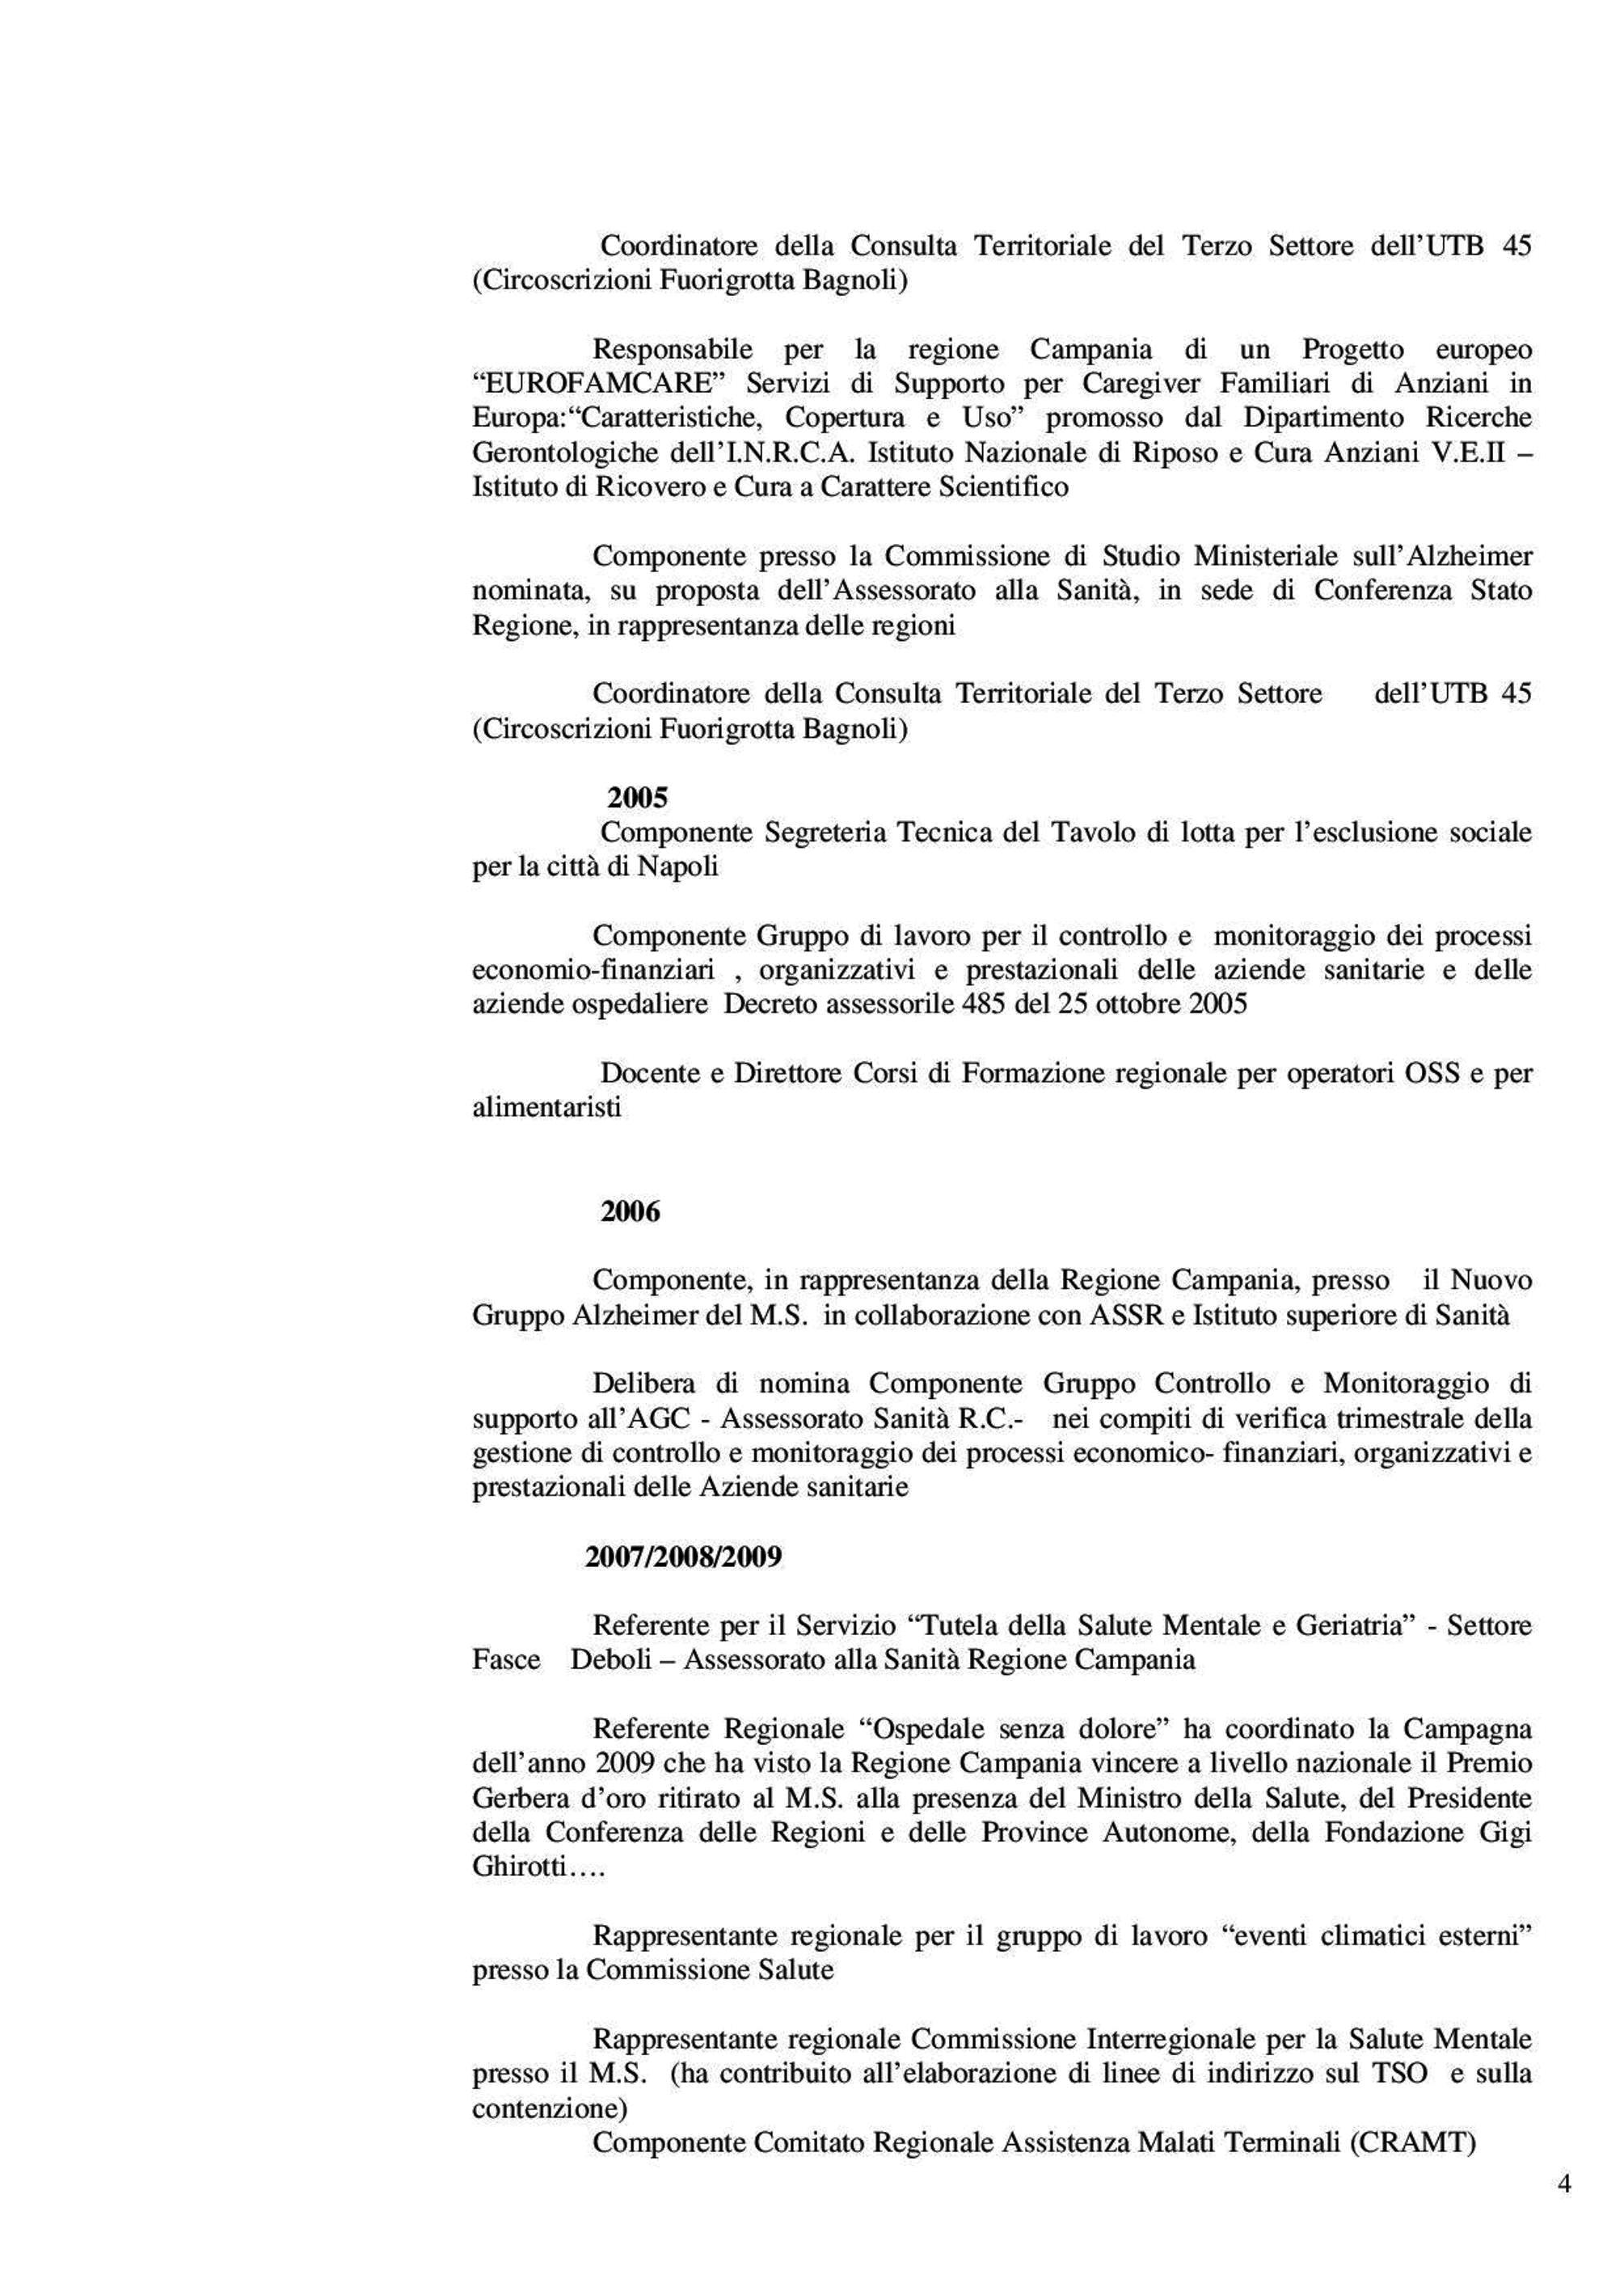 CUURICULUM MUSELLA FORMATO EUROPEO-page-004